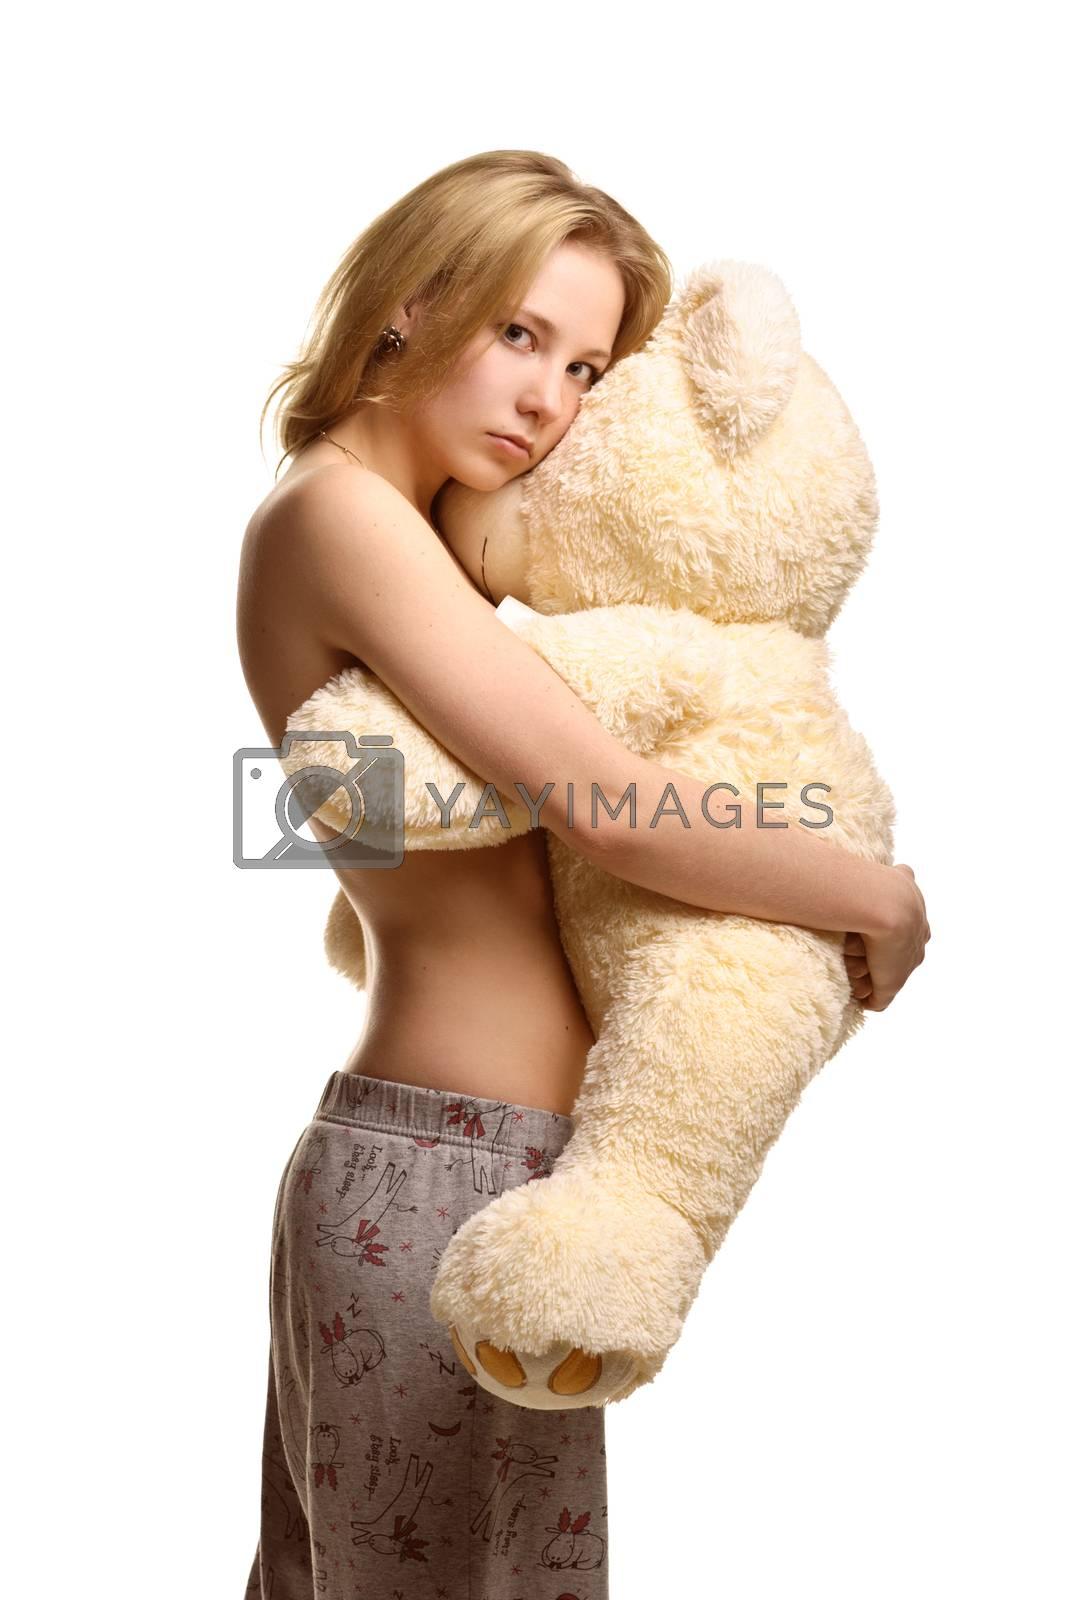 Concept: infantilism, childish, sadness, happiness. Girl in pijamas pants hugging giant plush bear toy isolated on white